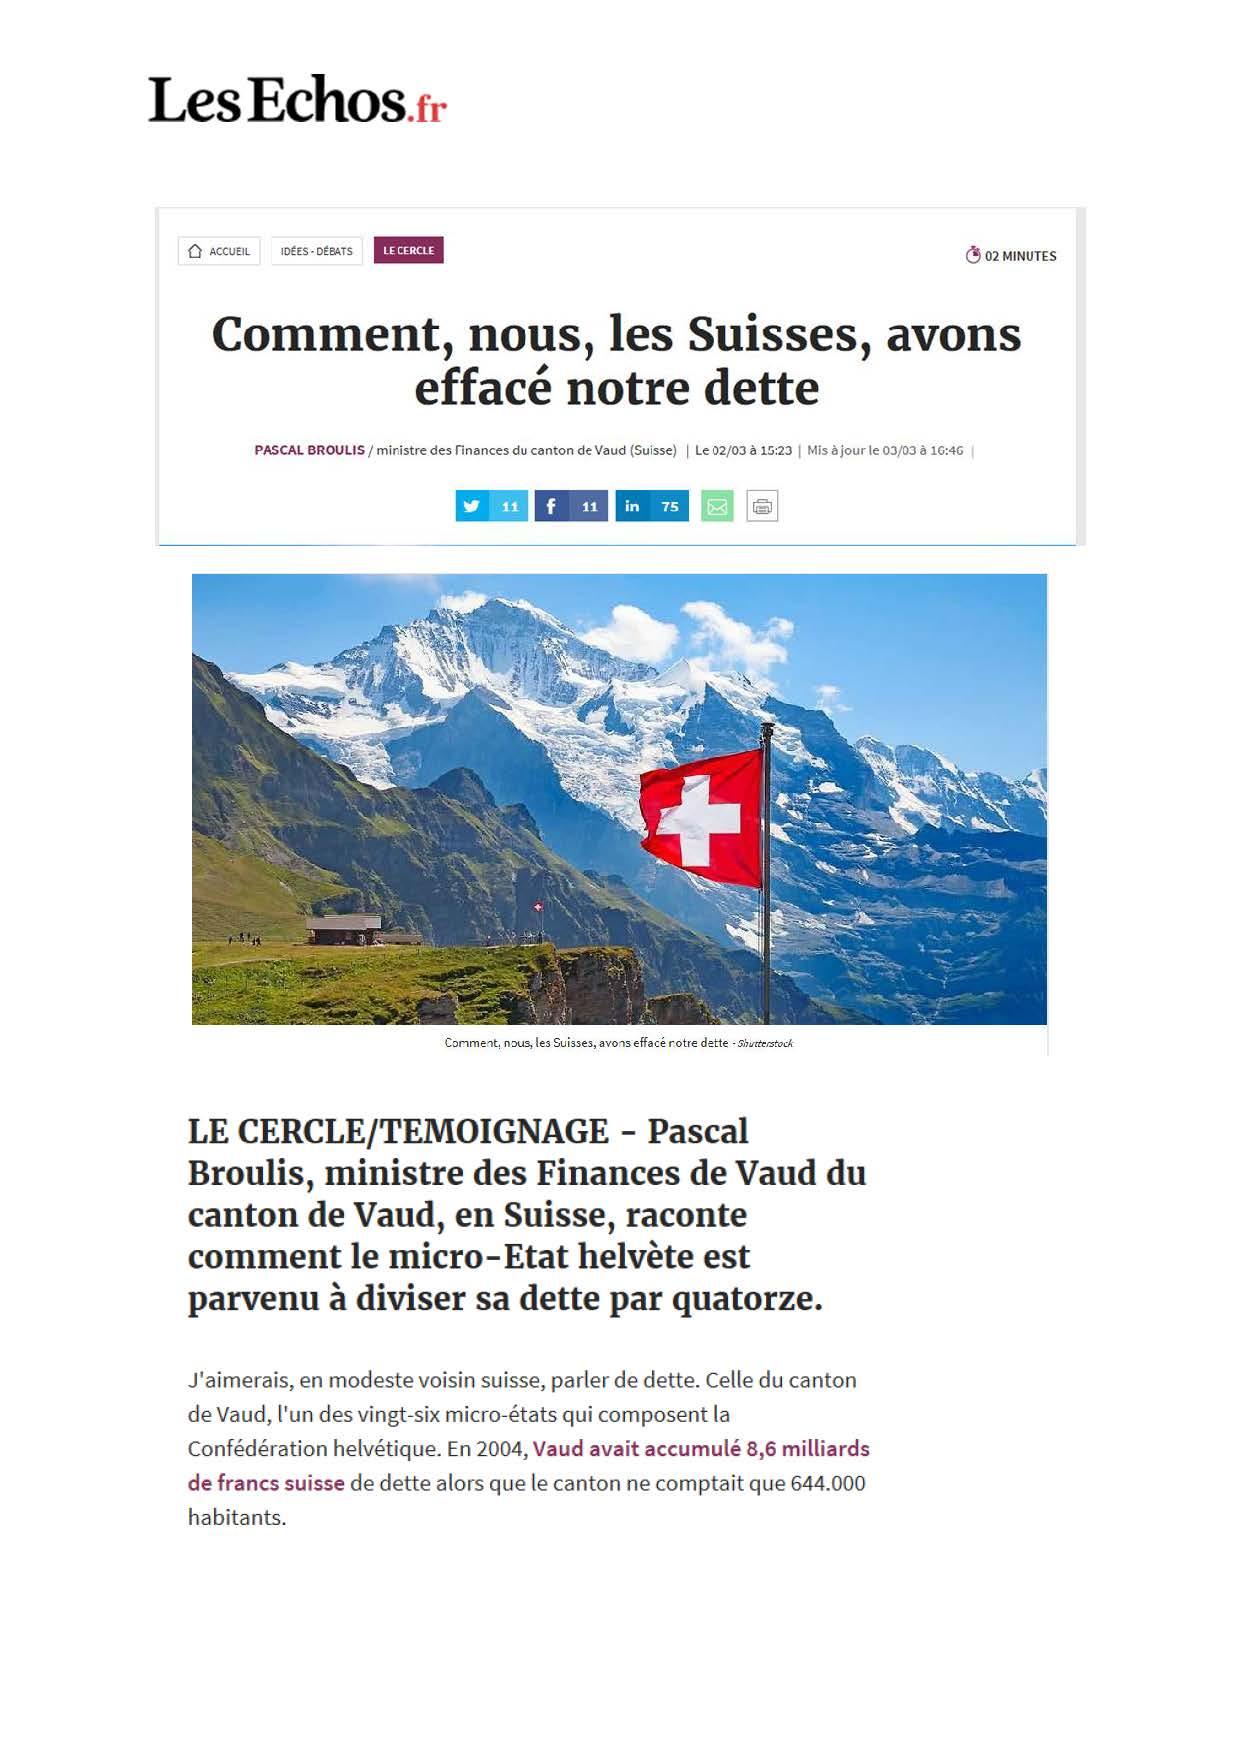 PB Les Echos.fr 2 mars 17_Page_1